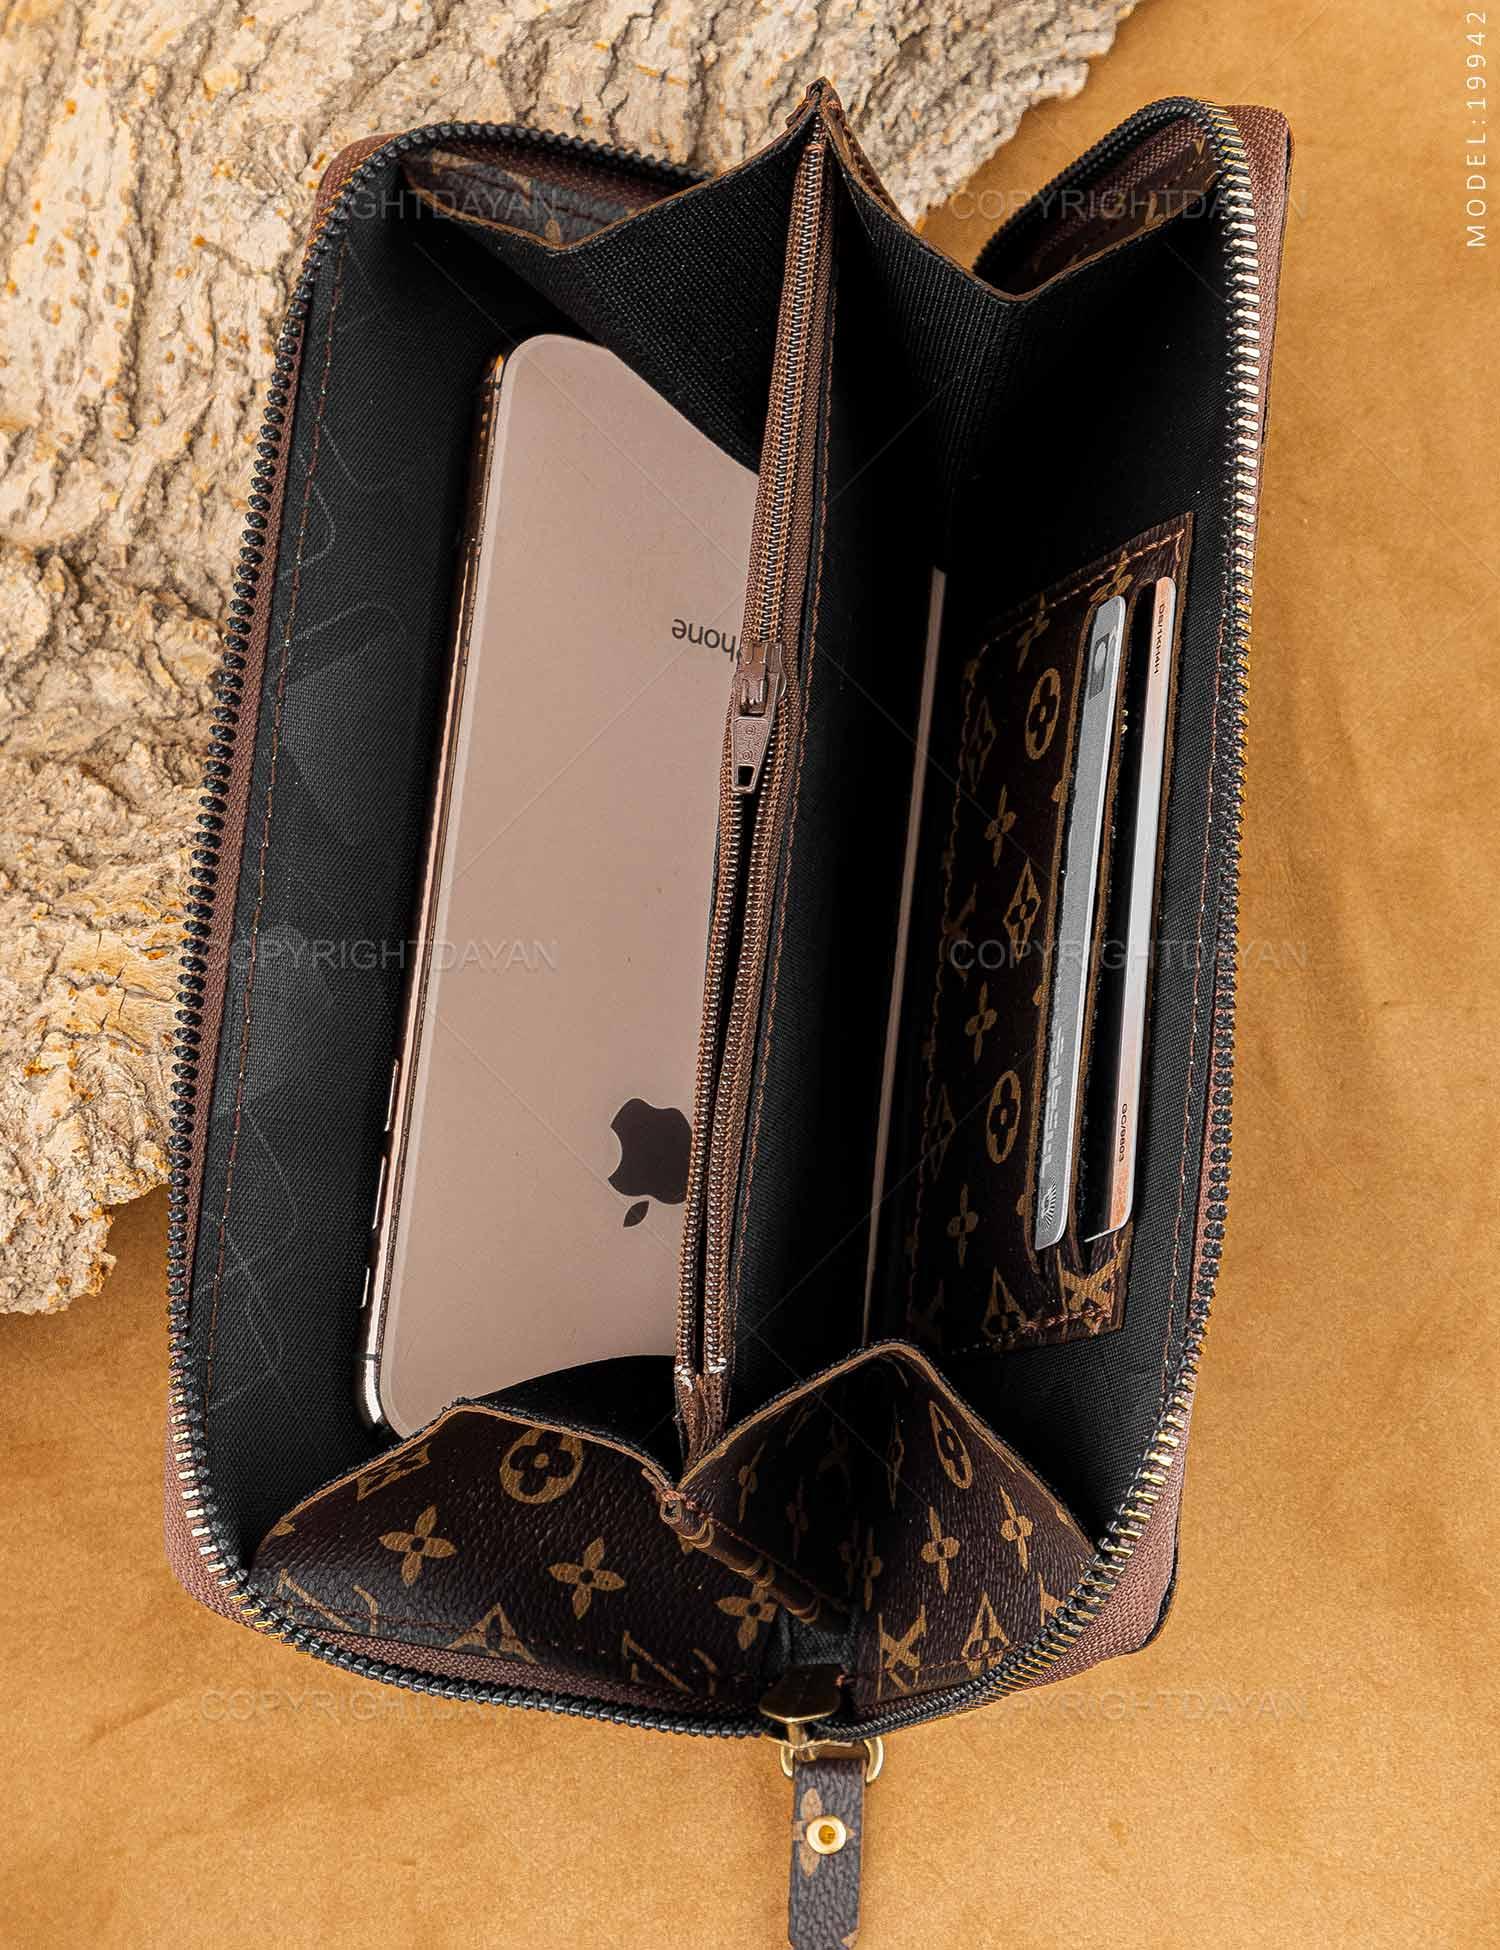 ست سه تیکه زنانه Louis Vuitton مدل 19942 ست سه تیکه زنانه Louis Vuitton مدل 19942 189,000 تومان